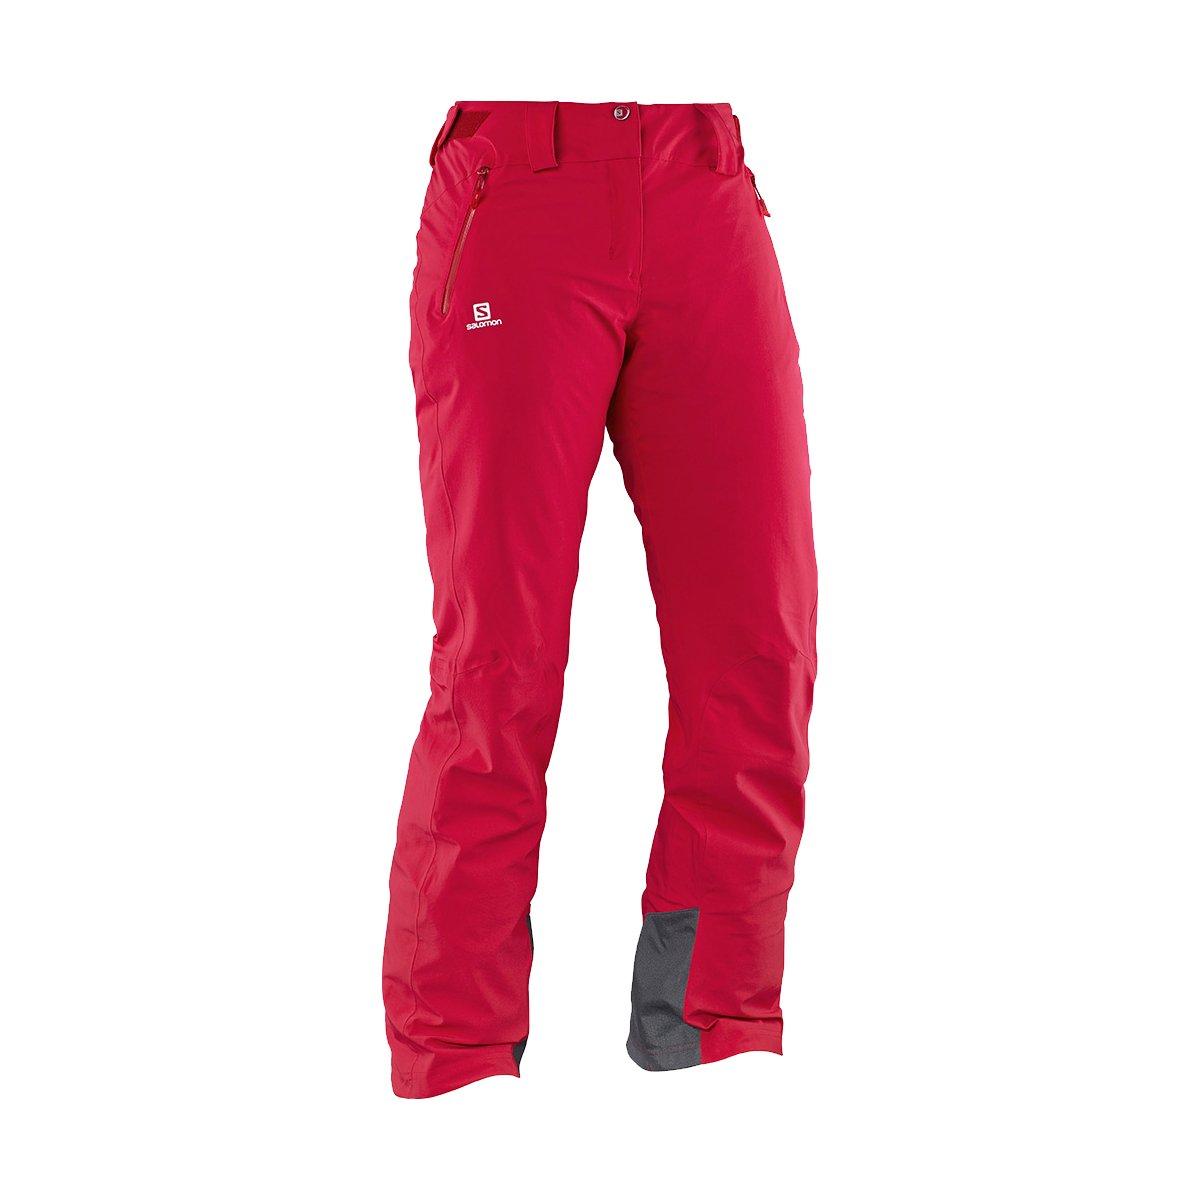 Salomon Sjezdové kalhoty ICEGLORY PANT W